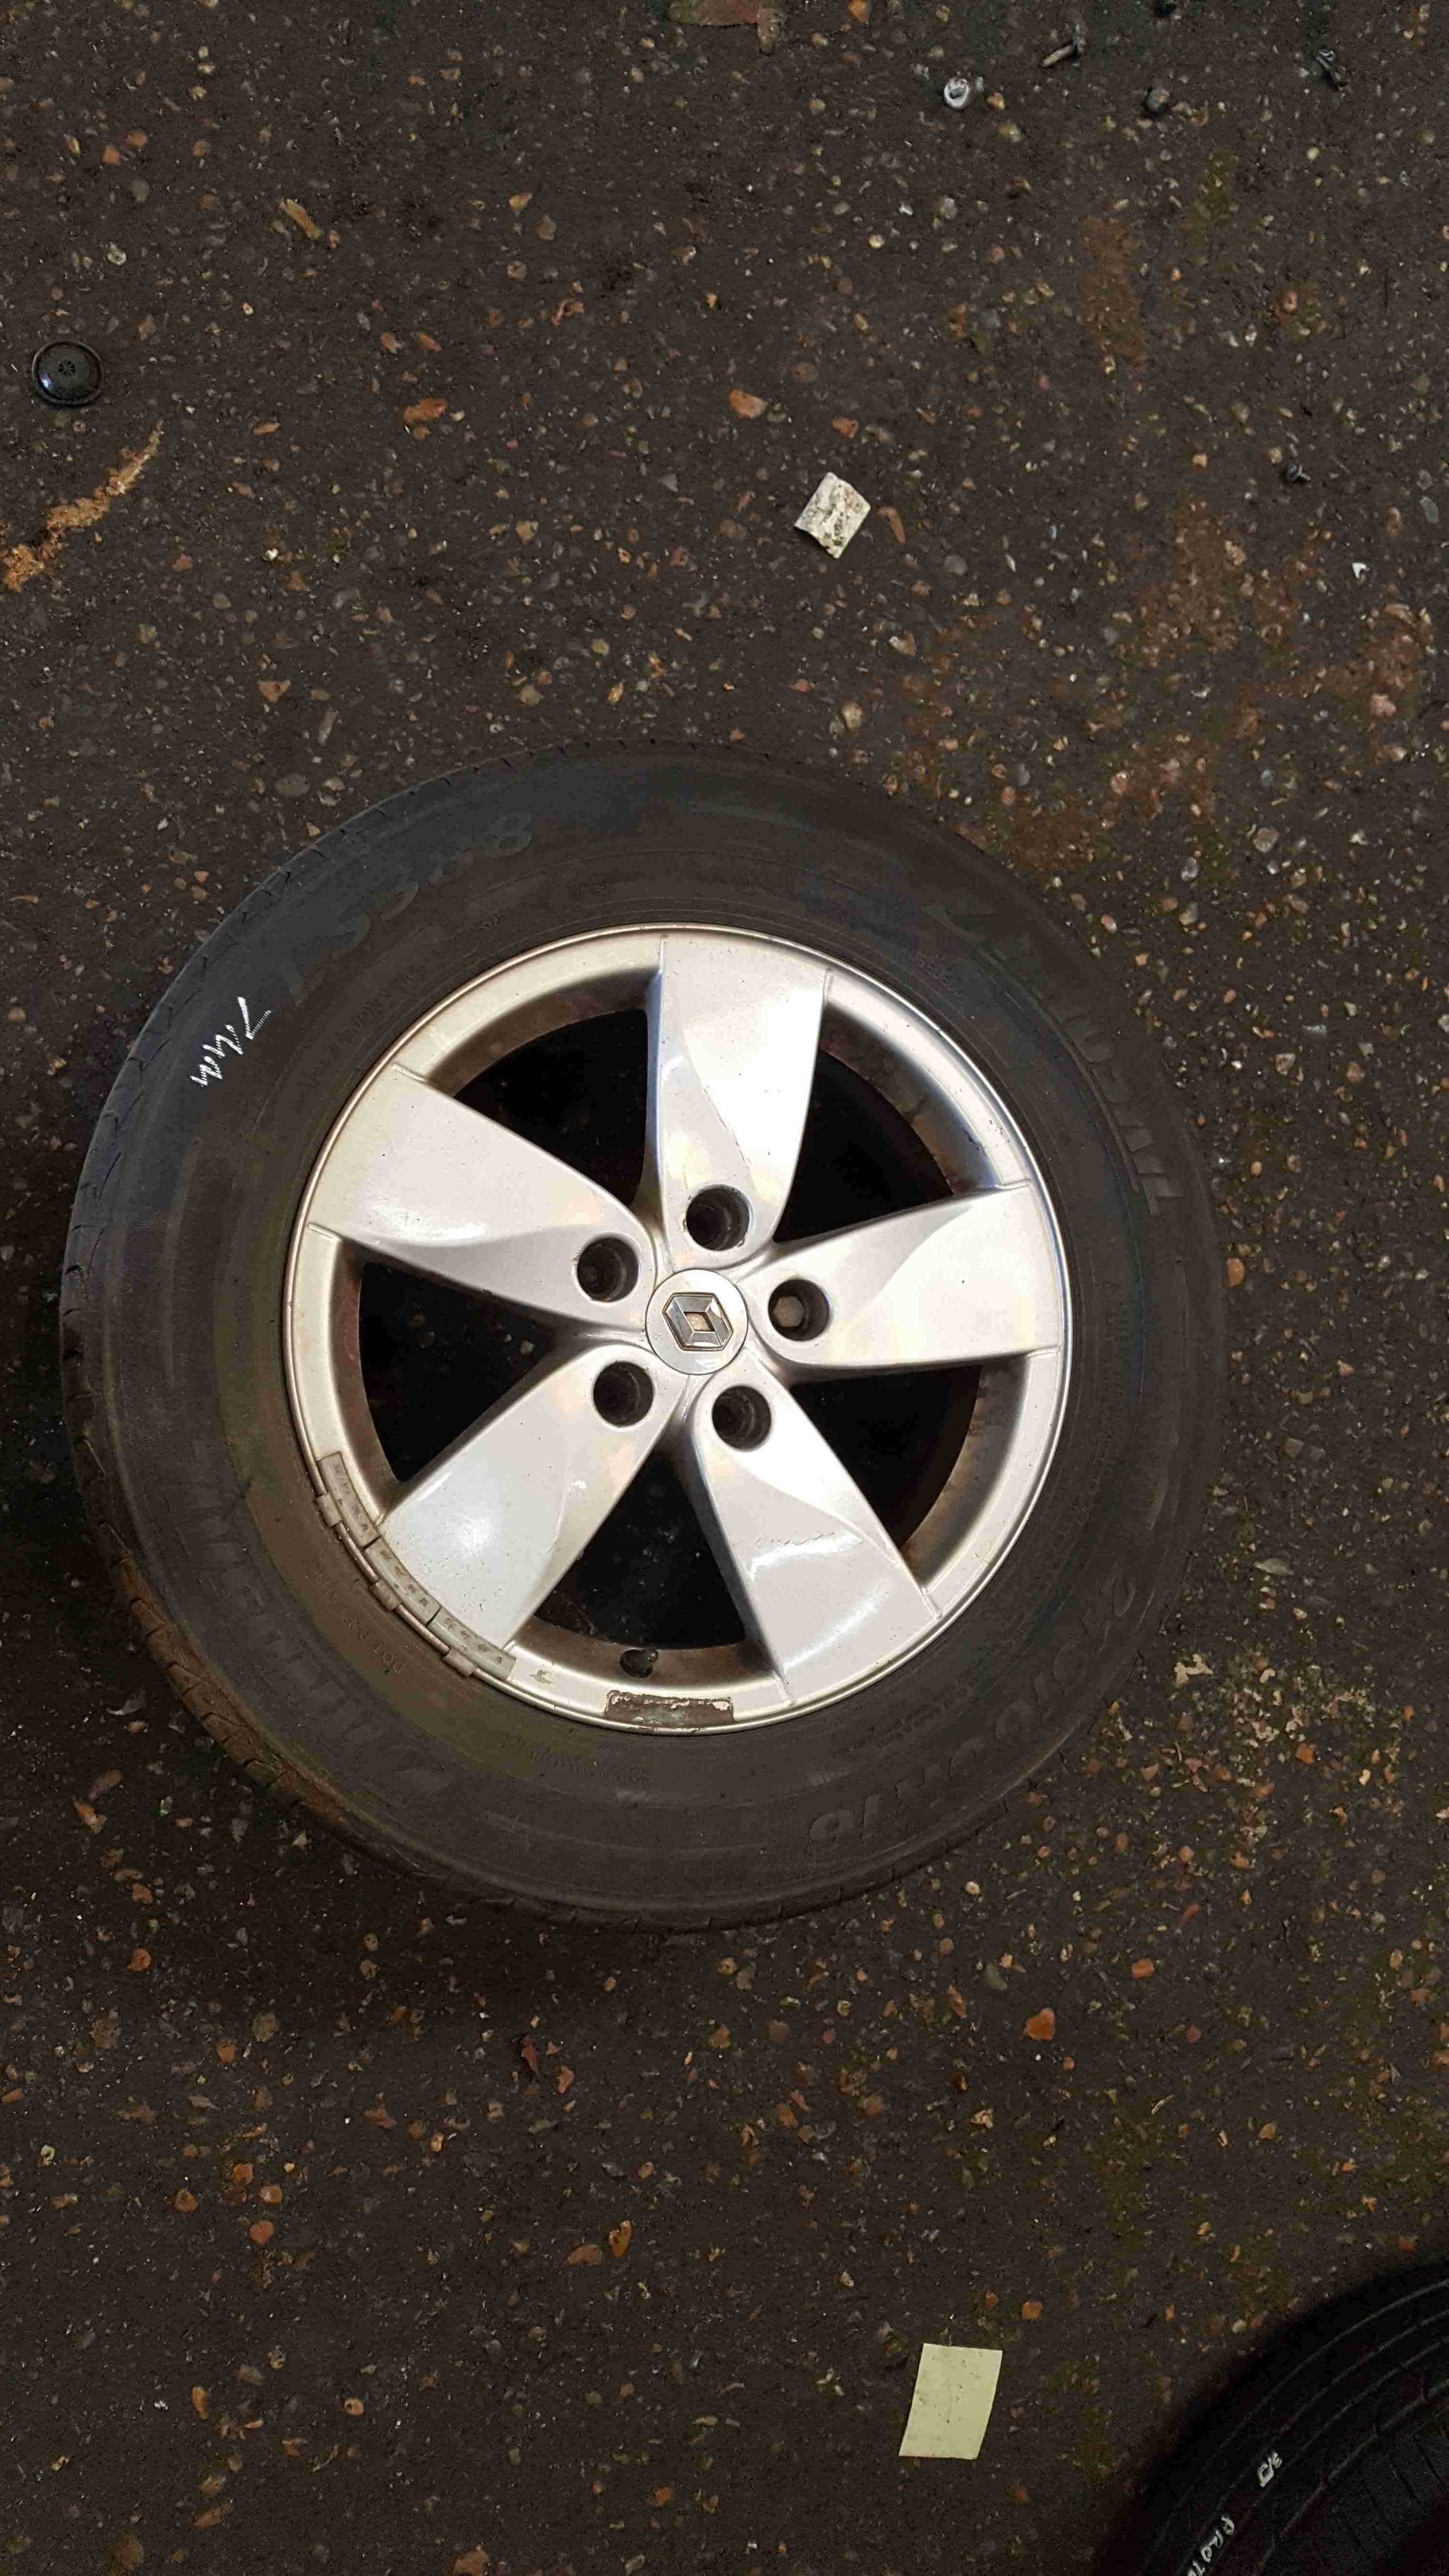 Renault Megane MK3 2008-2014 Proteus Alloy Wheel + Tyre 215 60 16 7mm